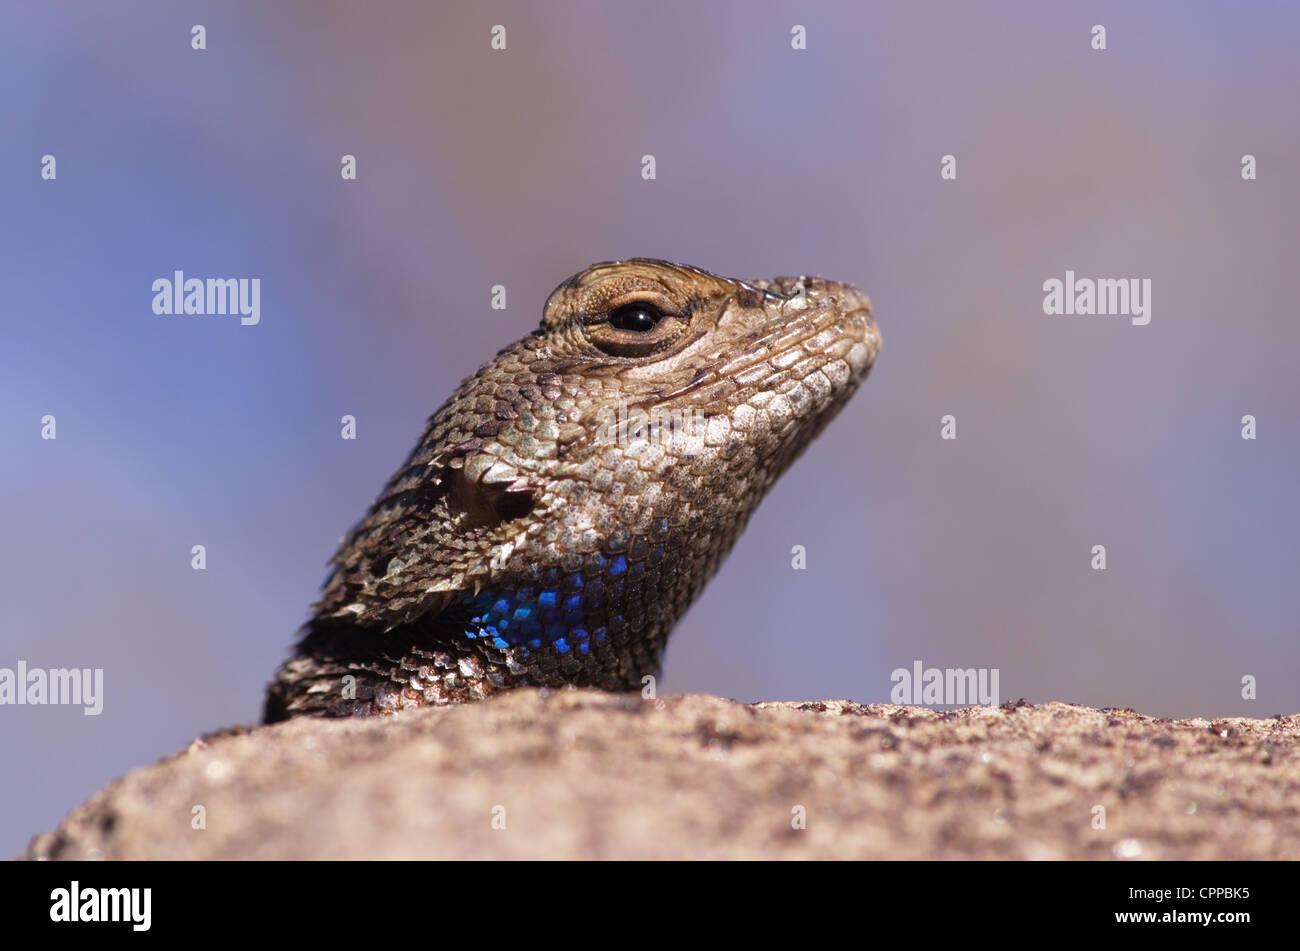 macro image of a plateau fence lizard head looking over a rock Stock Photo